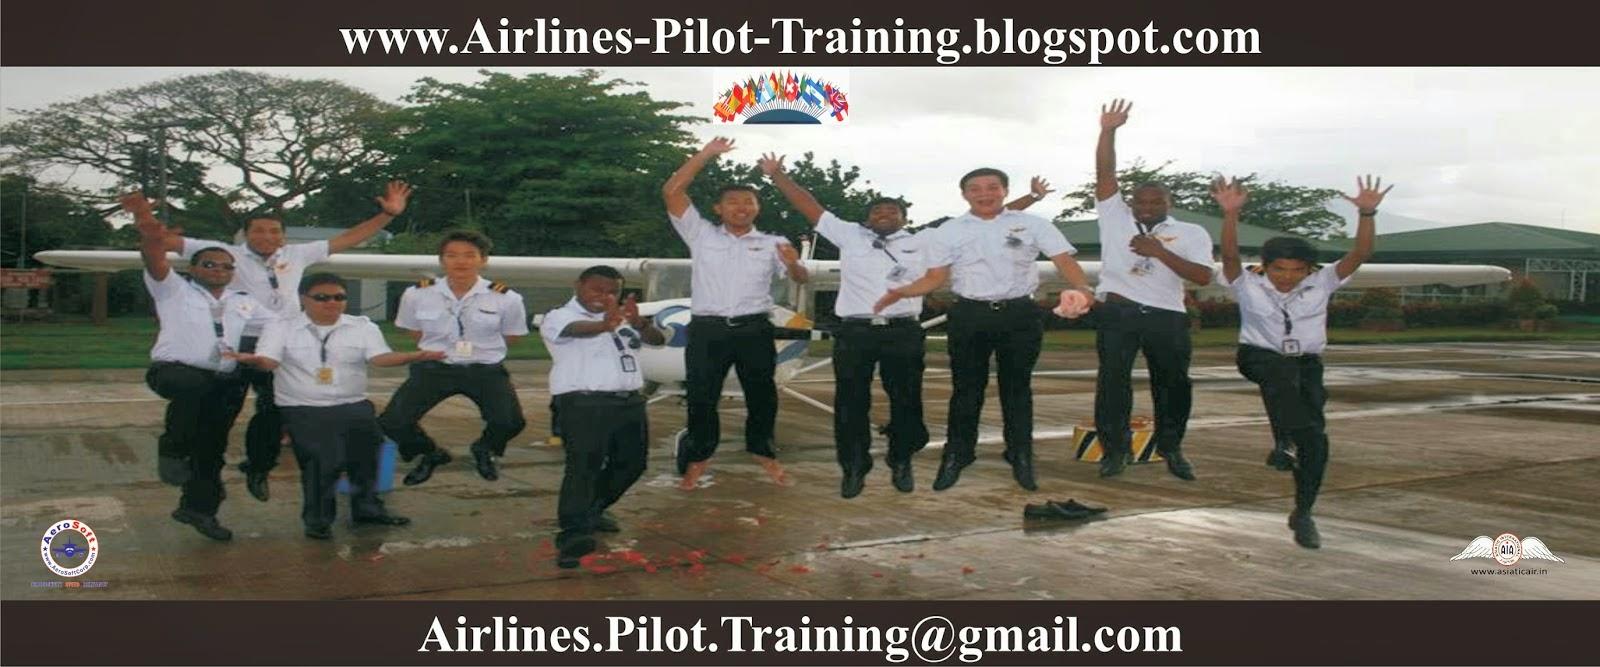 www.Airlines-Pilot-Training.blogspot.com